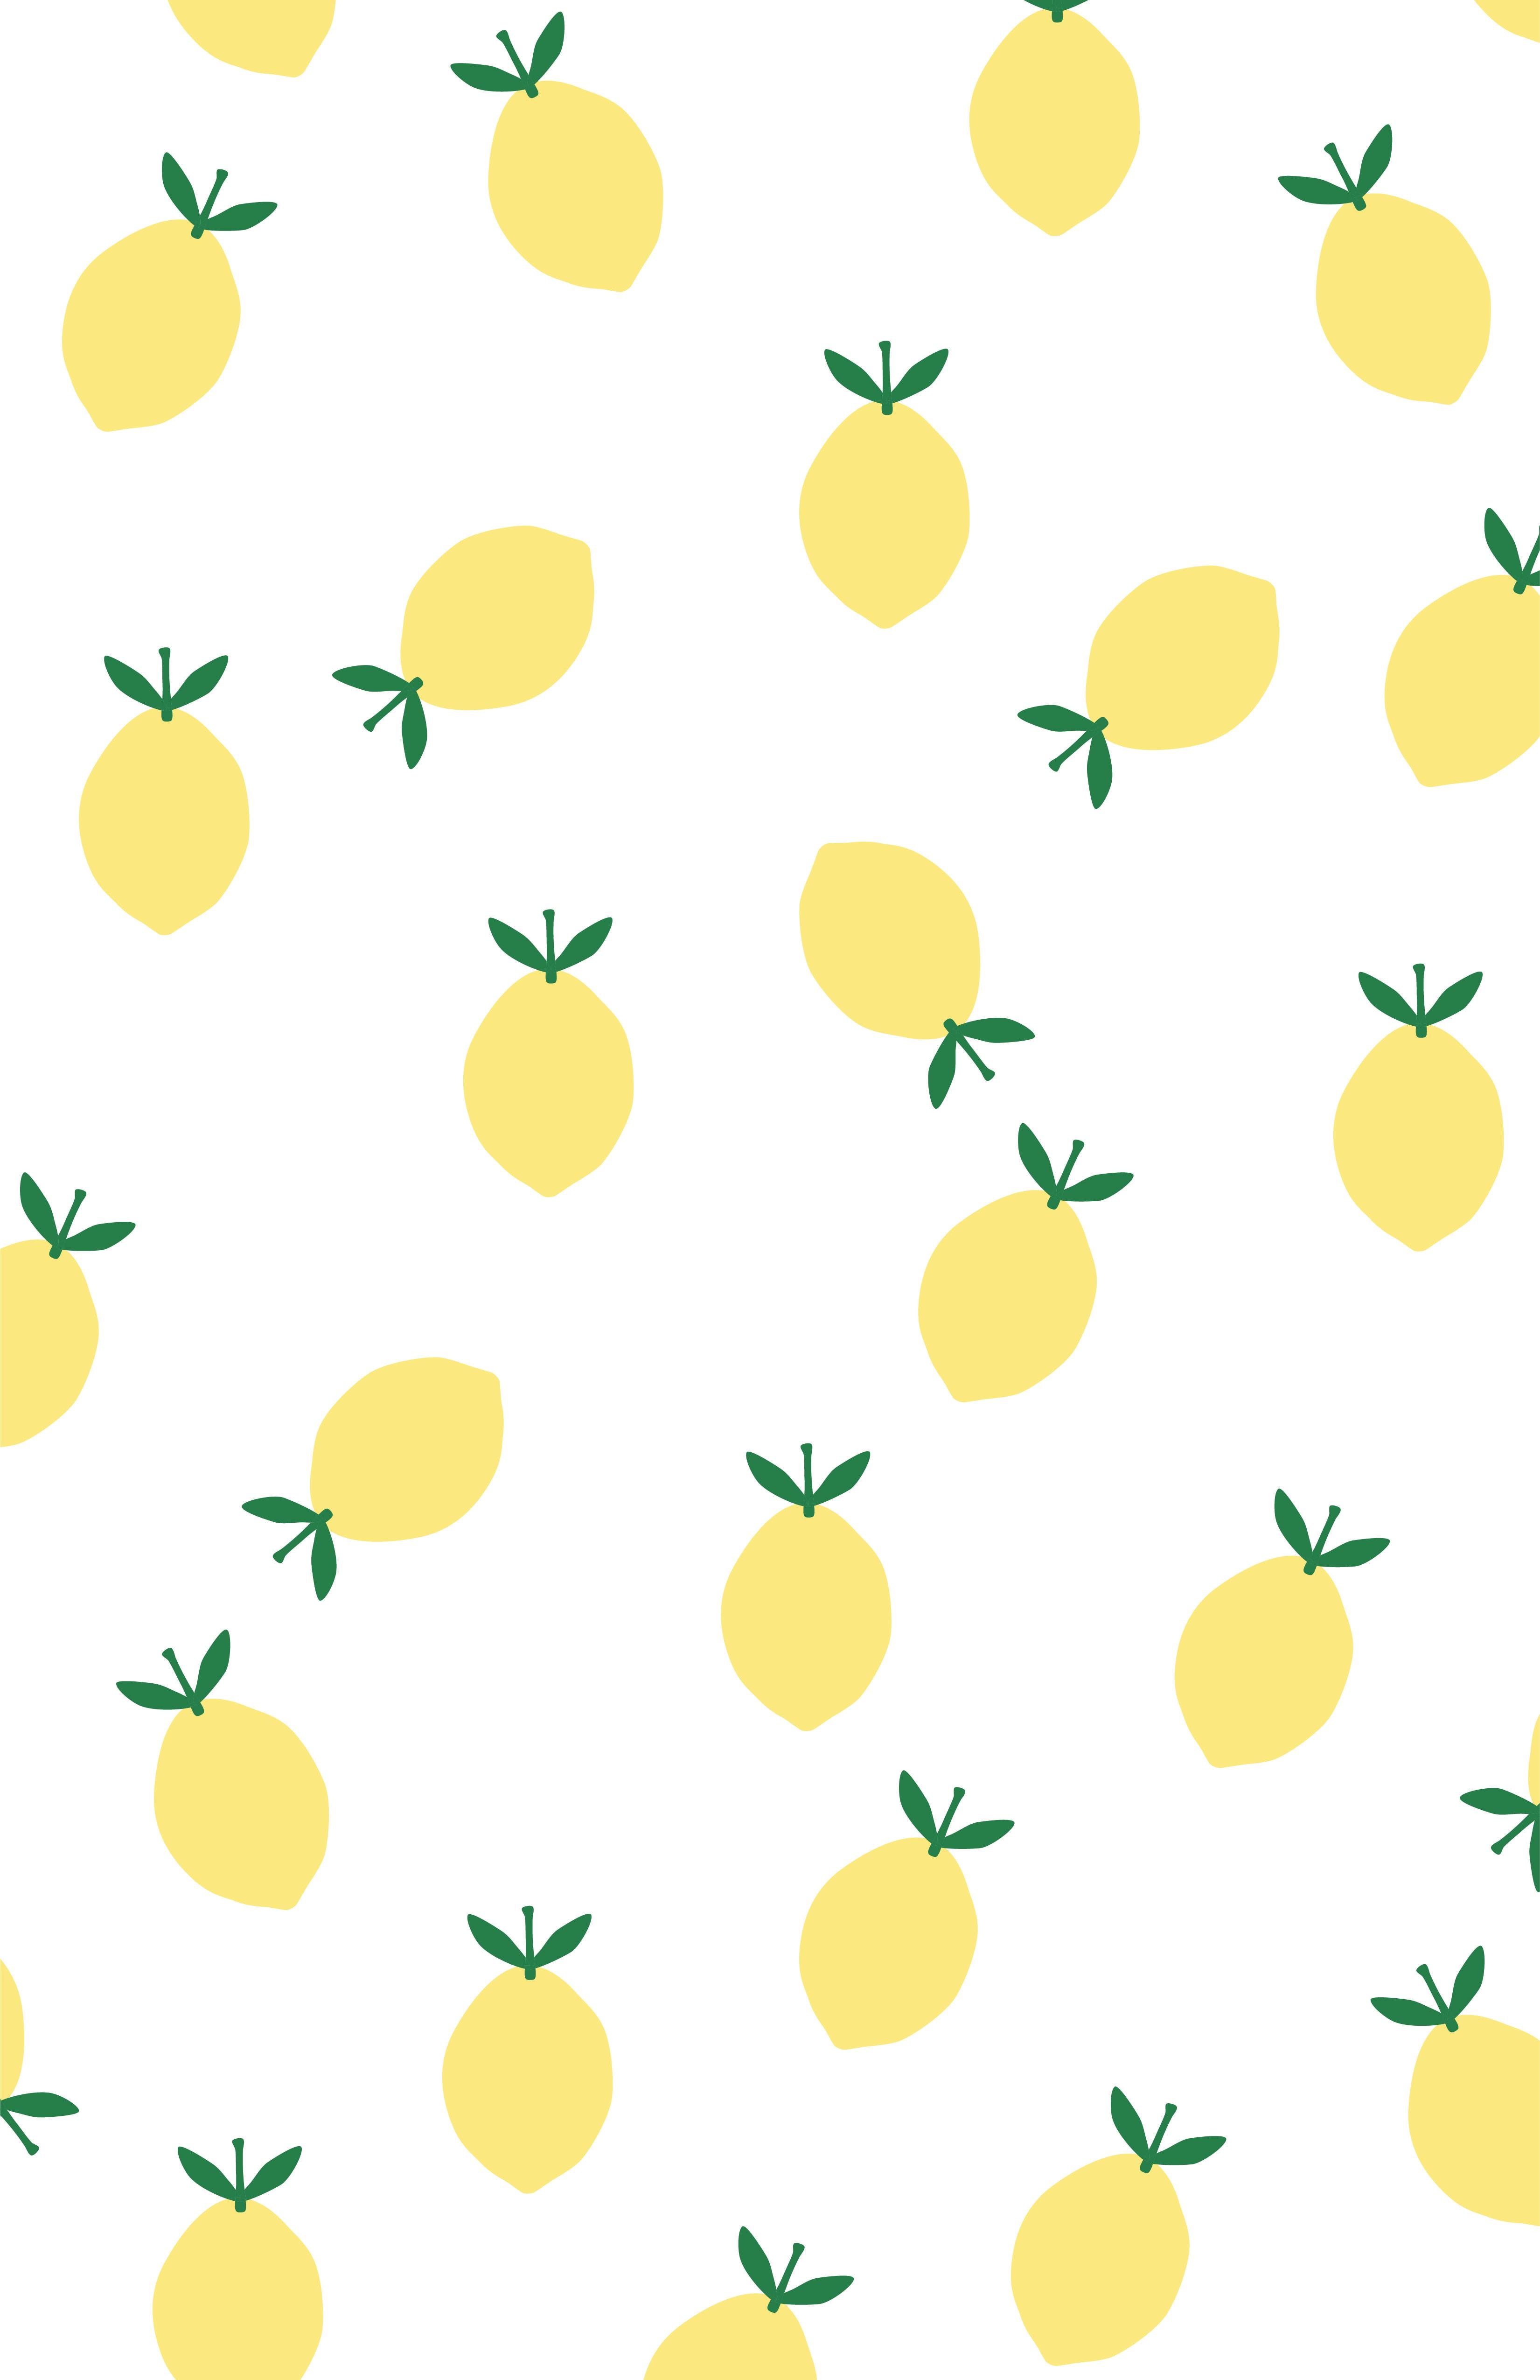 Prints By Rachael Lemon Simple Wallpapers Cute Patterns Wallpaper Iphone Background Wallpaper